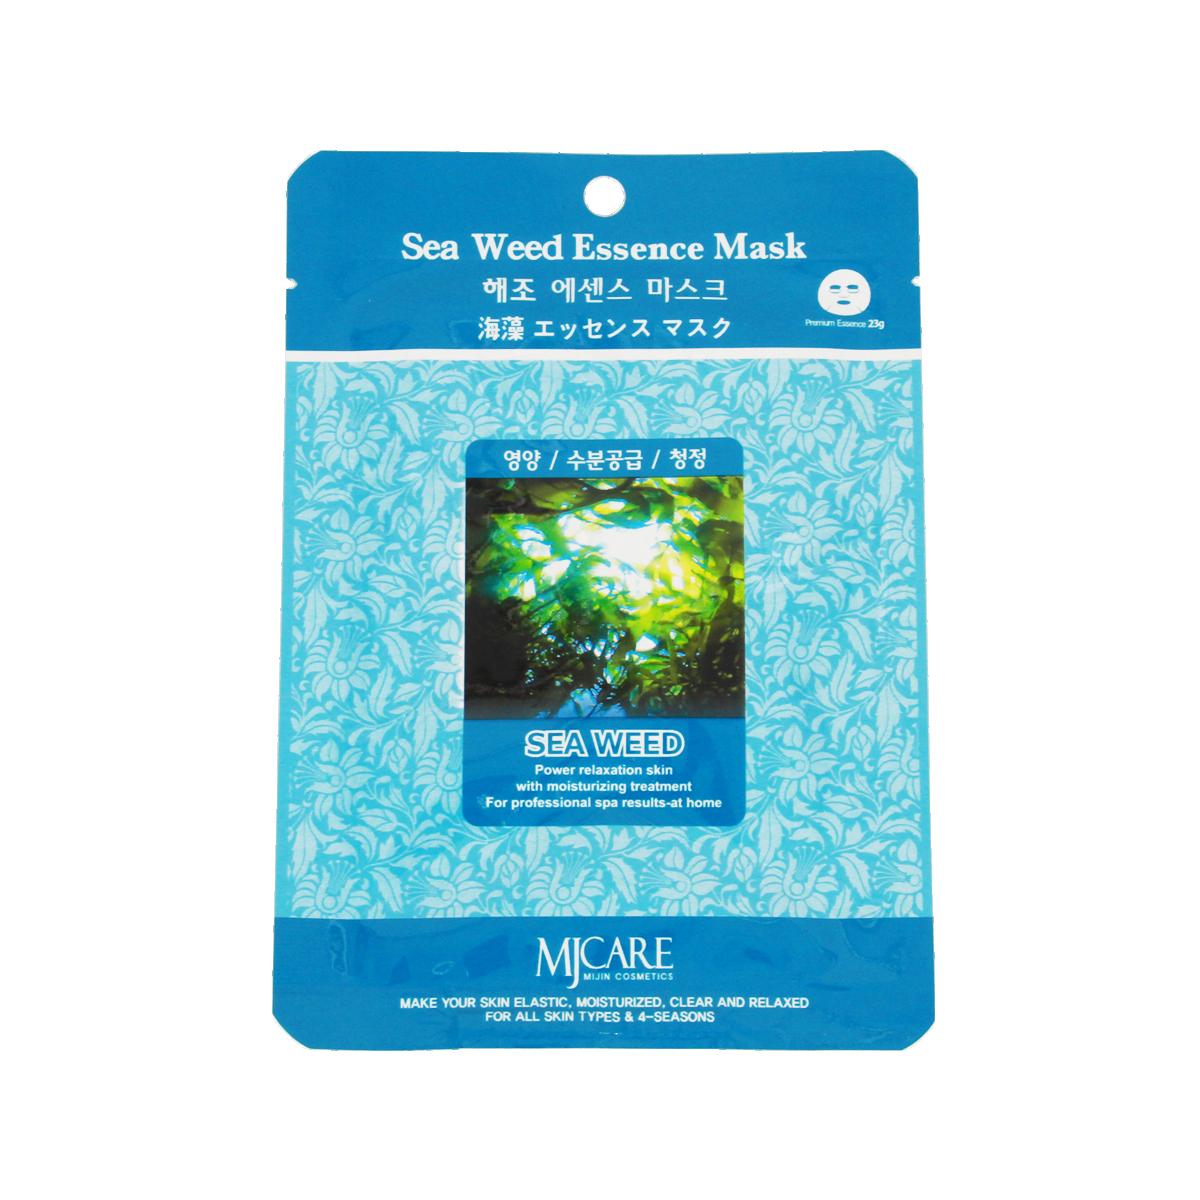 Маска тканевая Морские волосы Sea Weed Essence Mask, 23 г import_files_9c_9cfb5de562b611e980fc3408042974b1_9cfb5de662b611e980fc3408042974b1.png